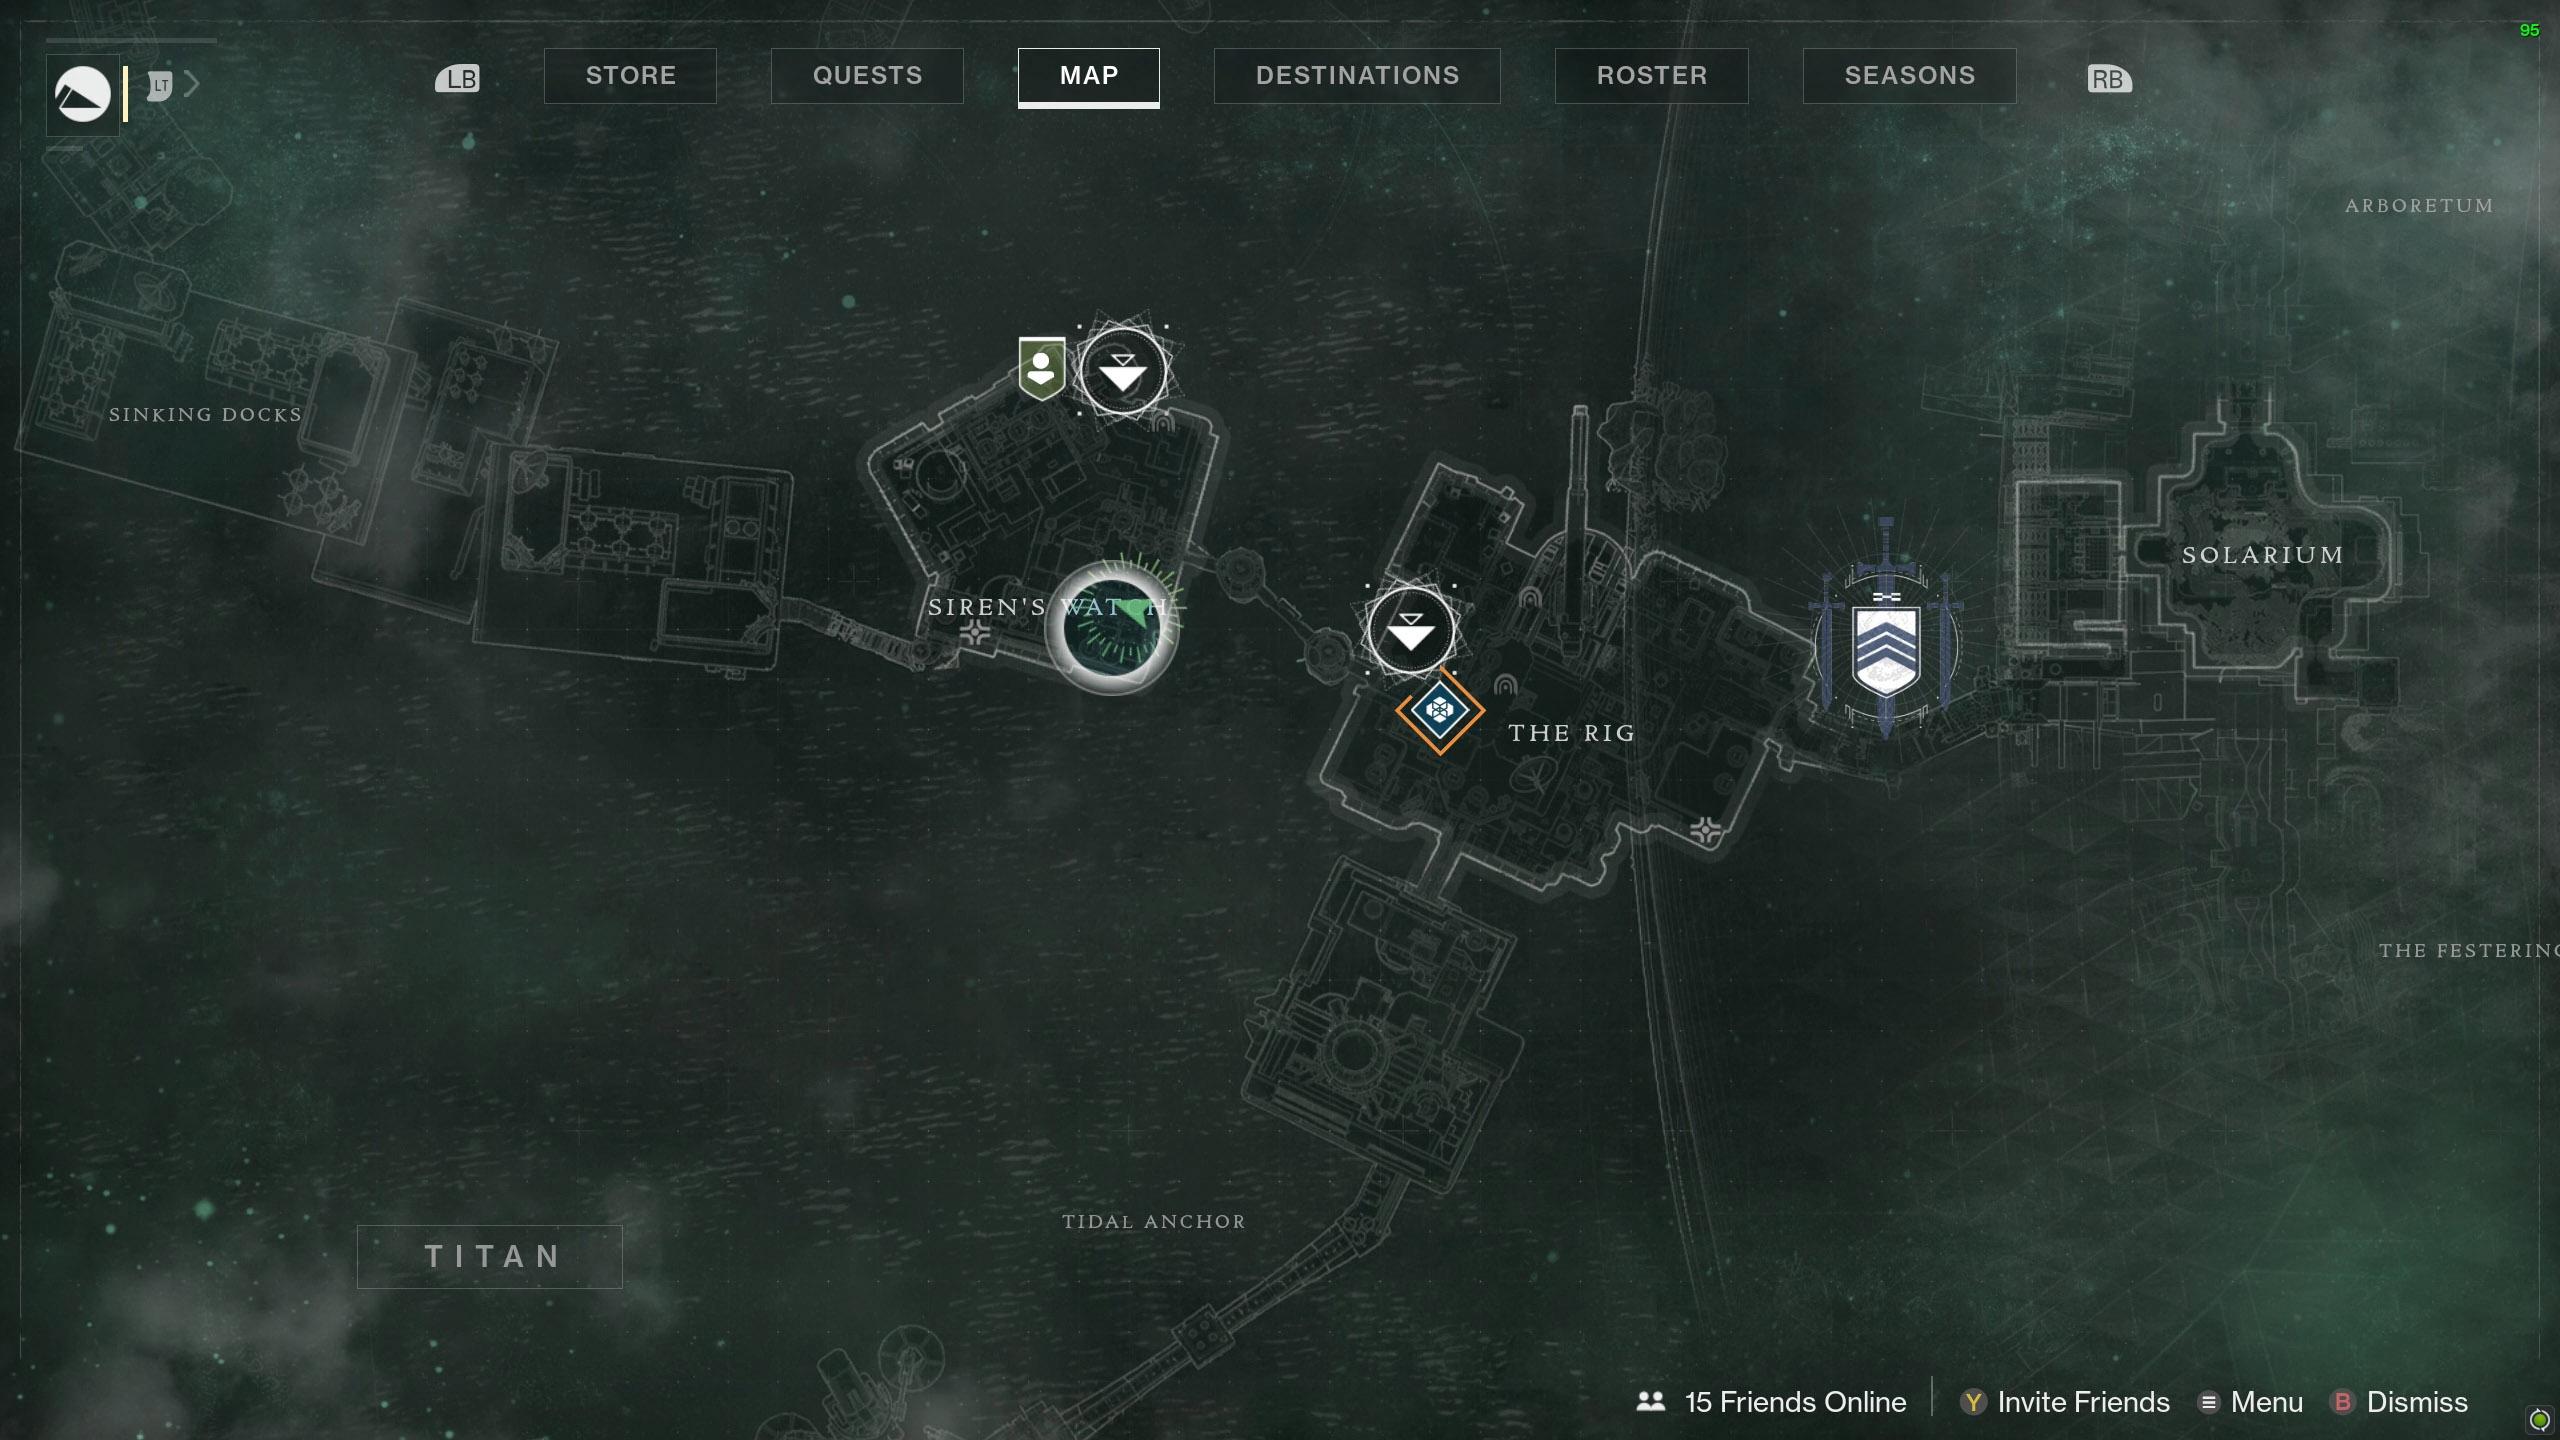 Destiny 2 Savathuns Eyes Titan Siren's Watch 1 map